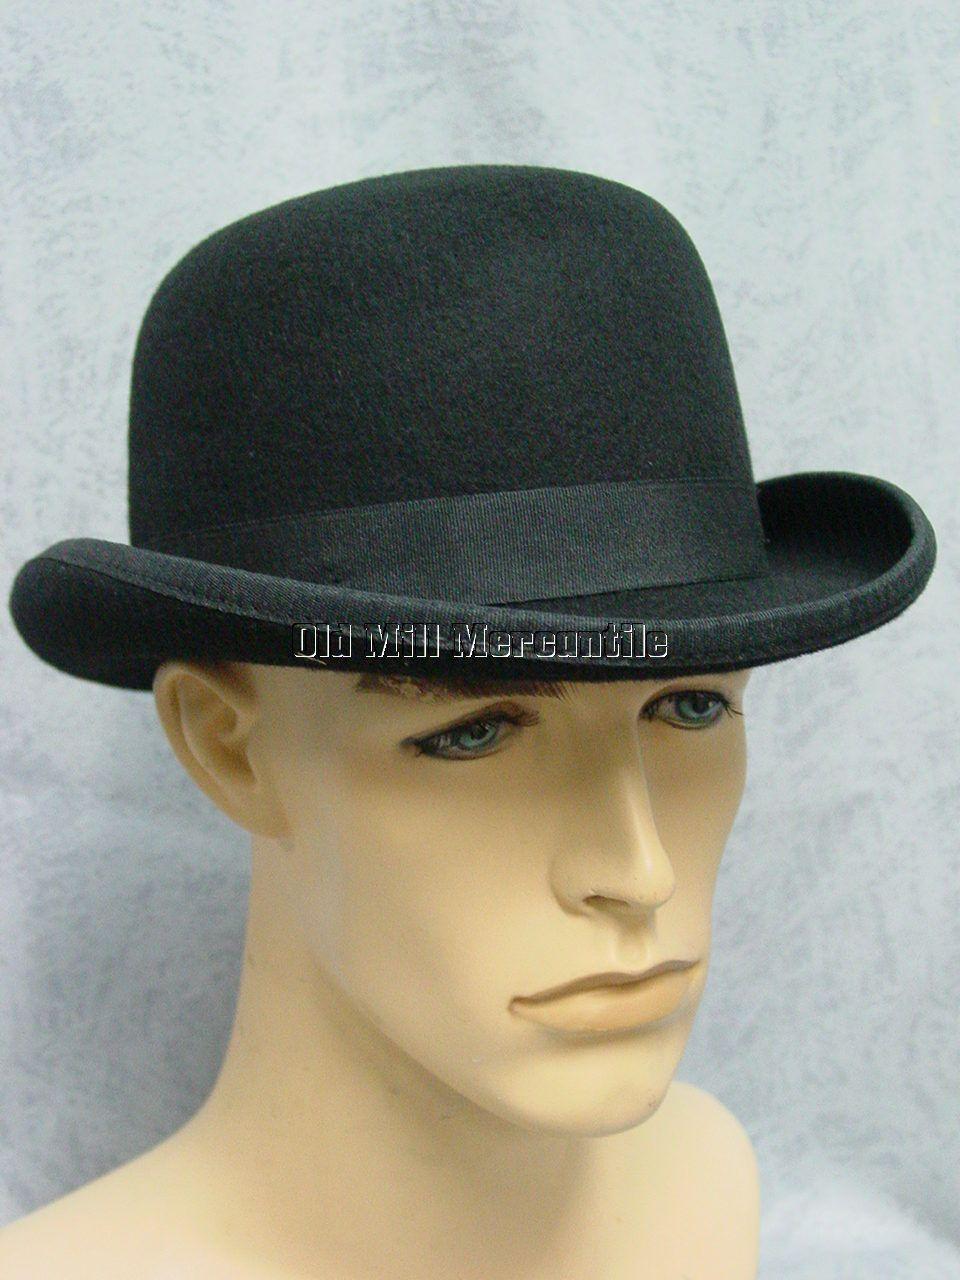 Mens Derby Old West bowler derby hat 100% wool felt quality hat M ... 41e1c8aa1d9